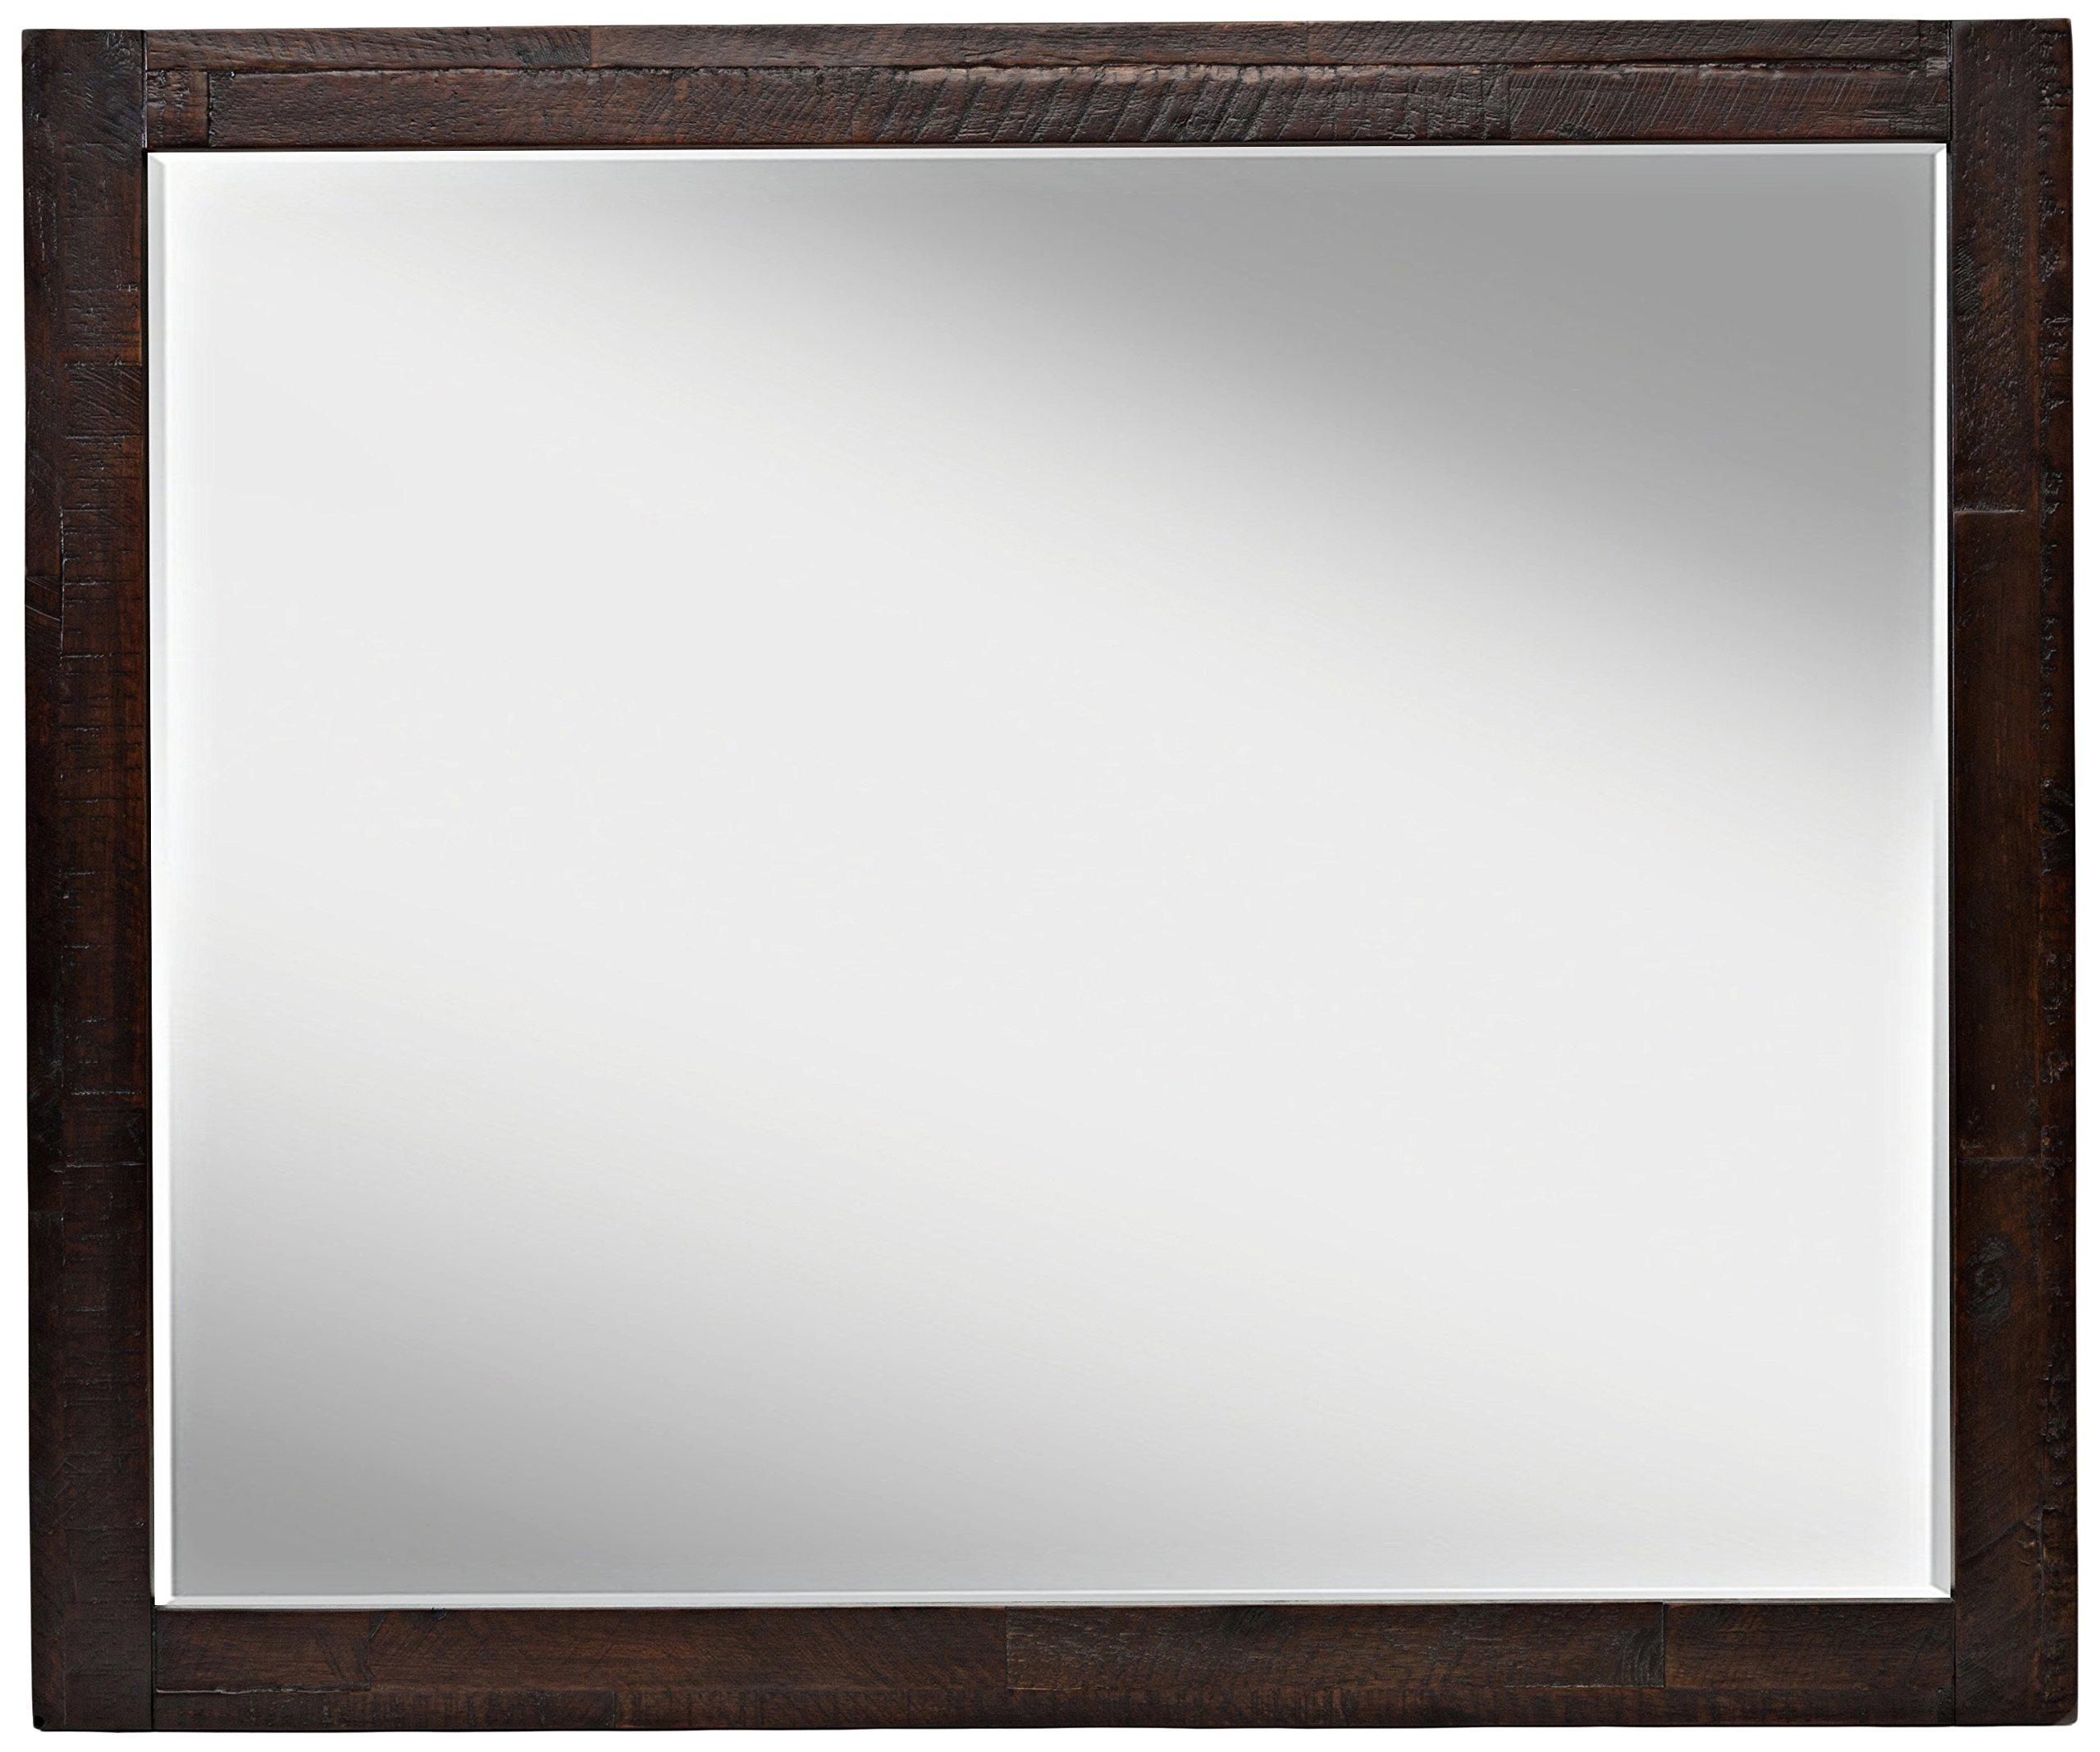 Jofran: 707-20, Kona Grove, Landscape Mirror, 42''W X 3''D X 35''H, Deep Chocolate Finish, (Set of 1) by Jofran